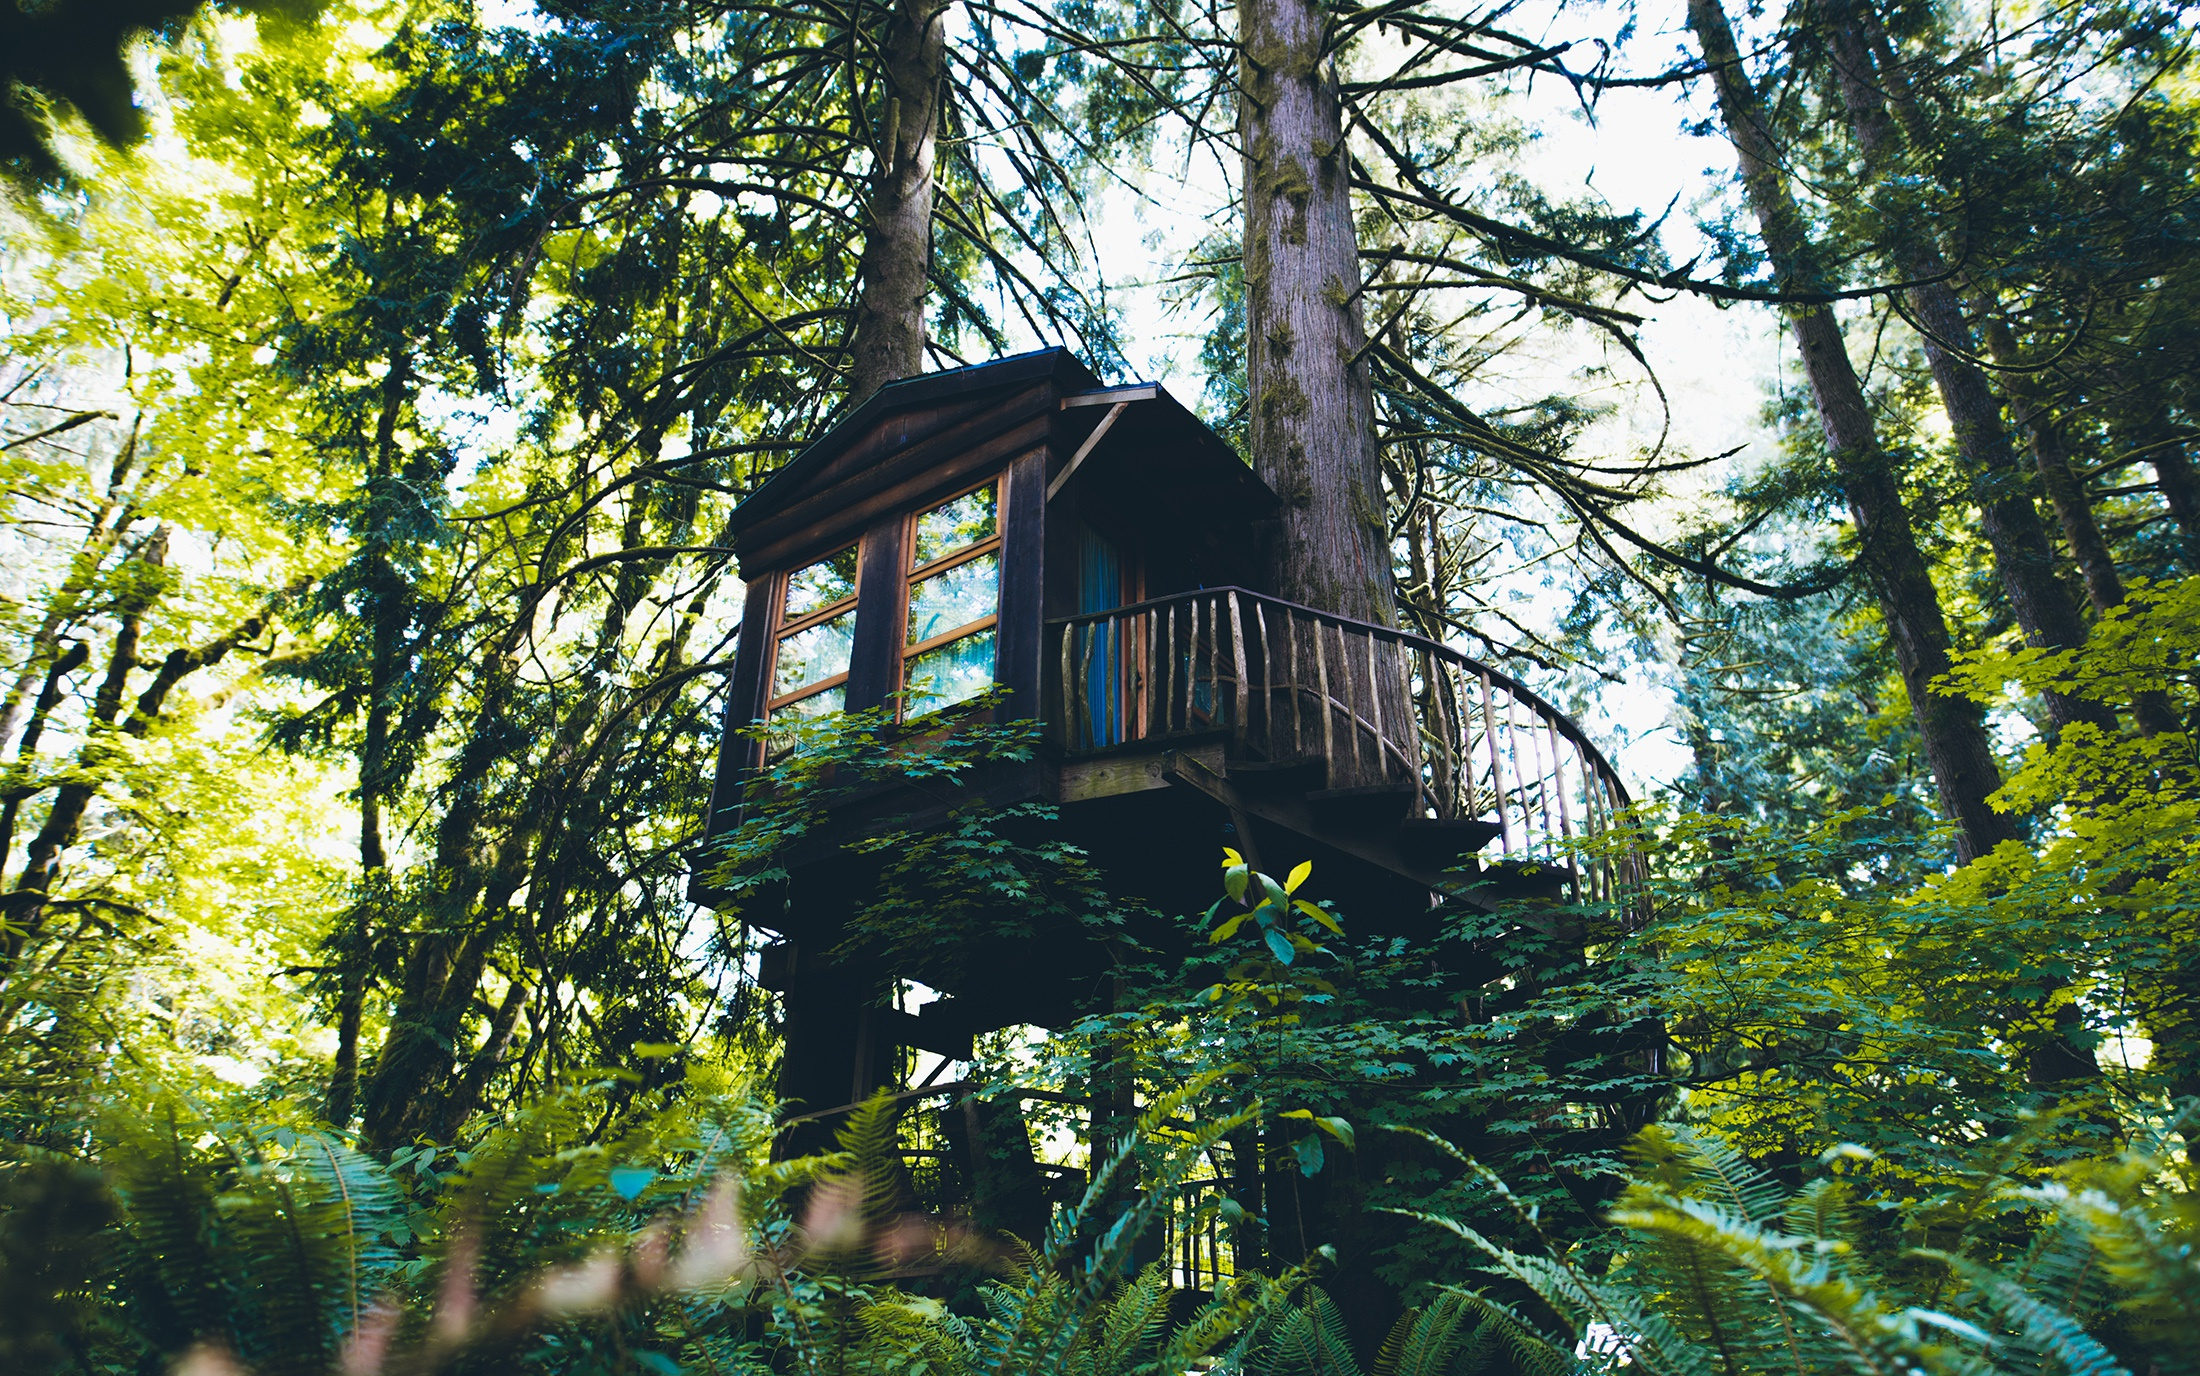 отпустила век дом на дереве в лесу фото отца